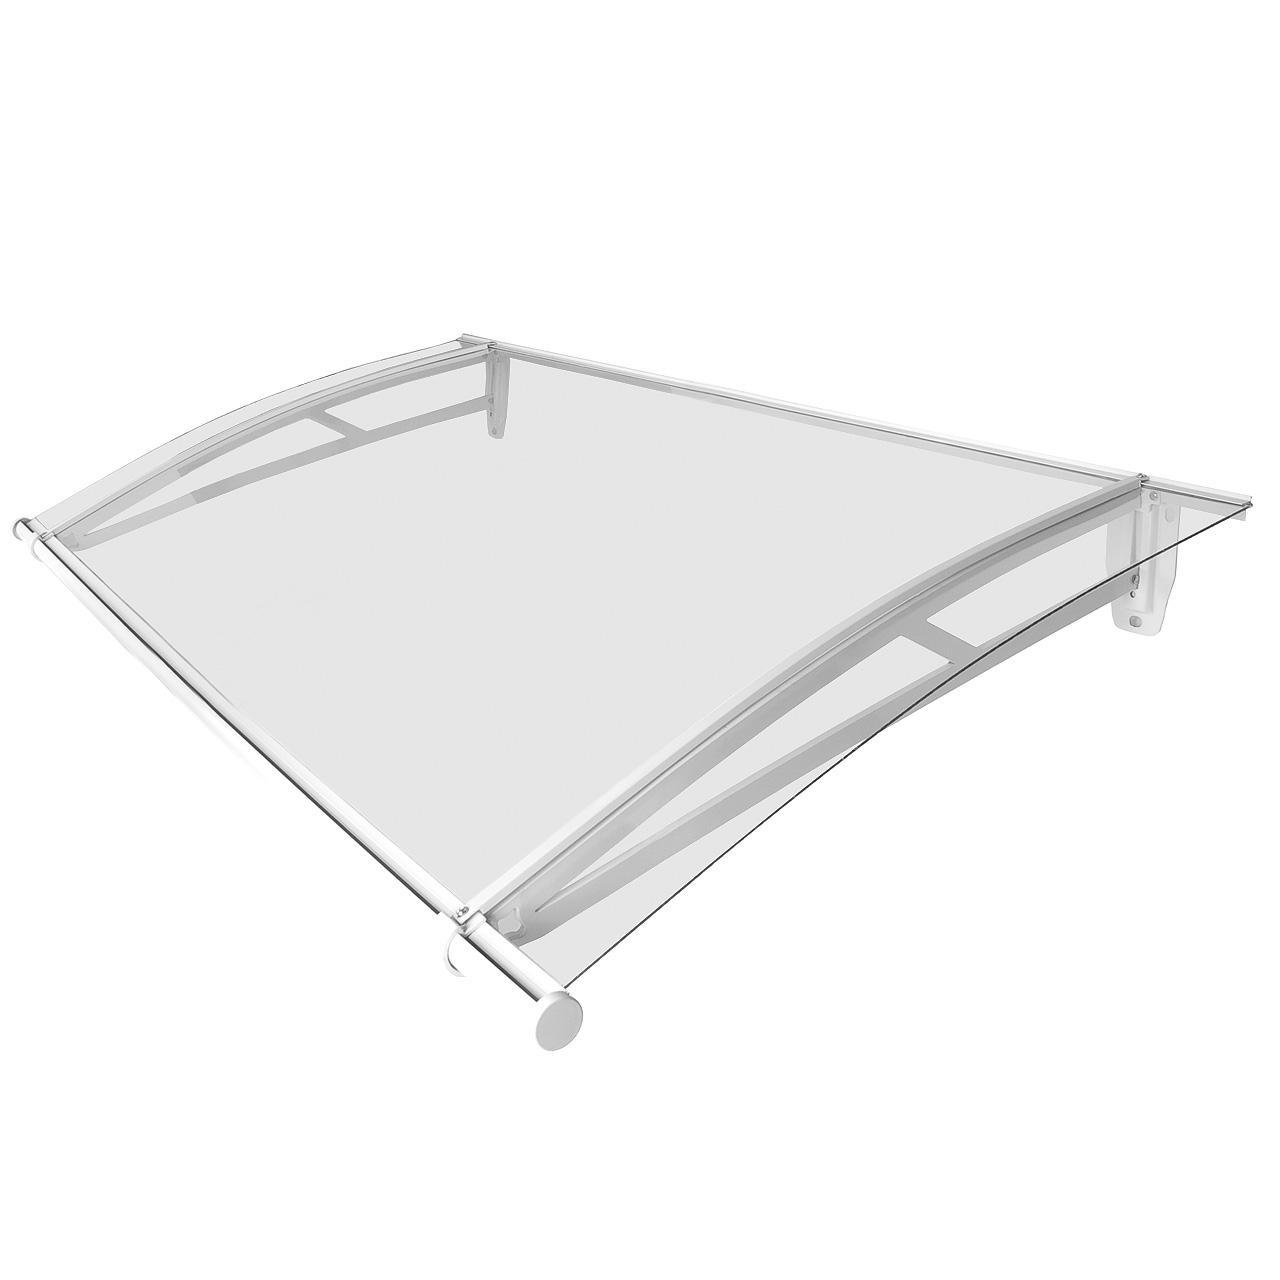 Homelux Haustür Vordach Überdachung Pultvordach Aluminium 120 cm x ...